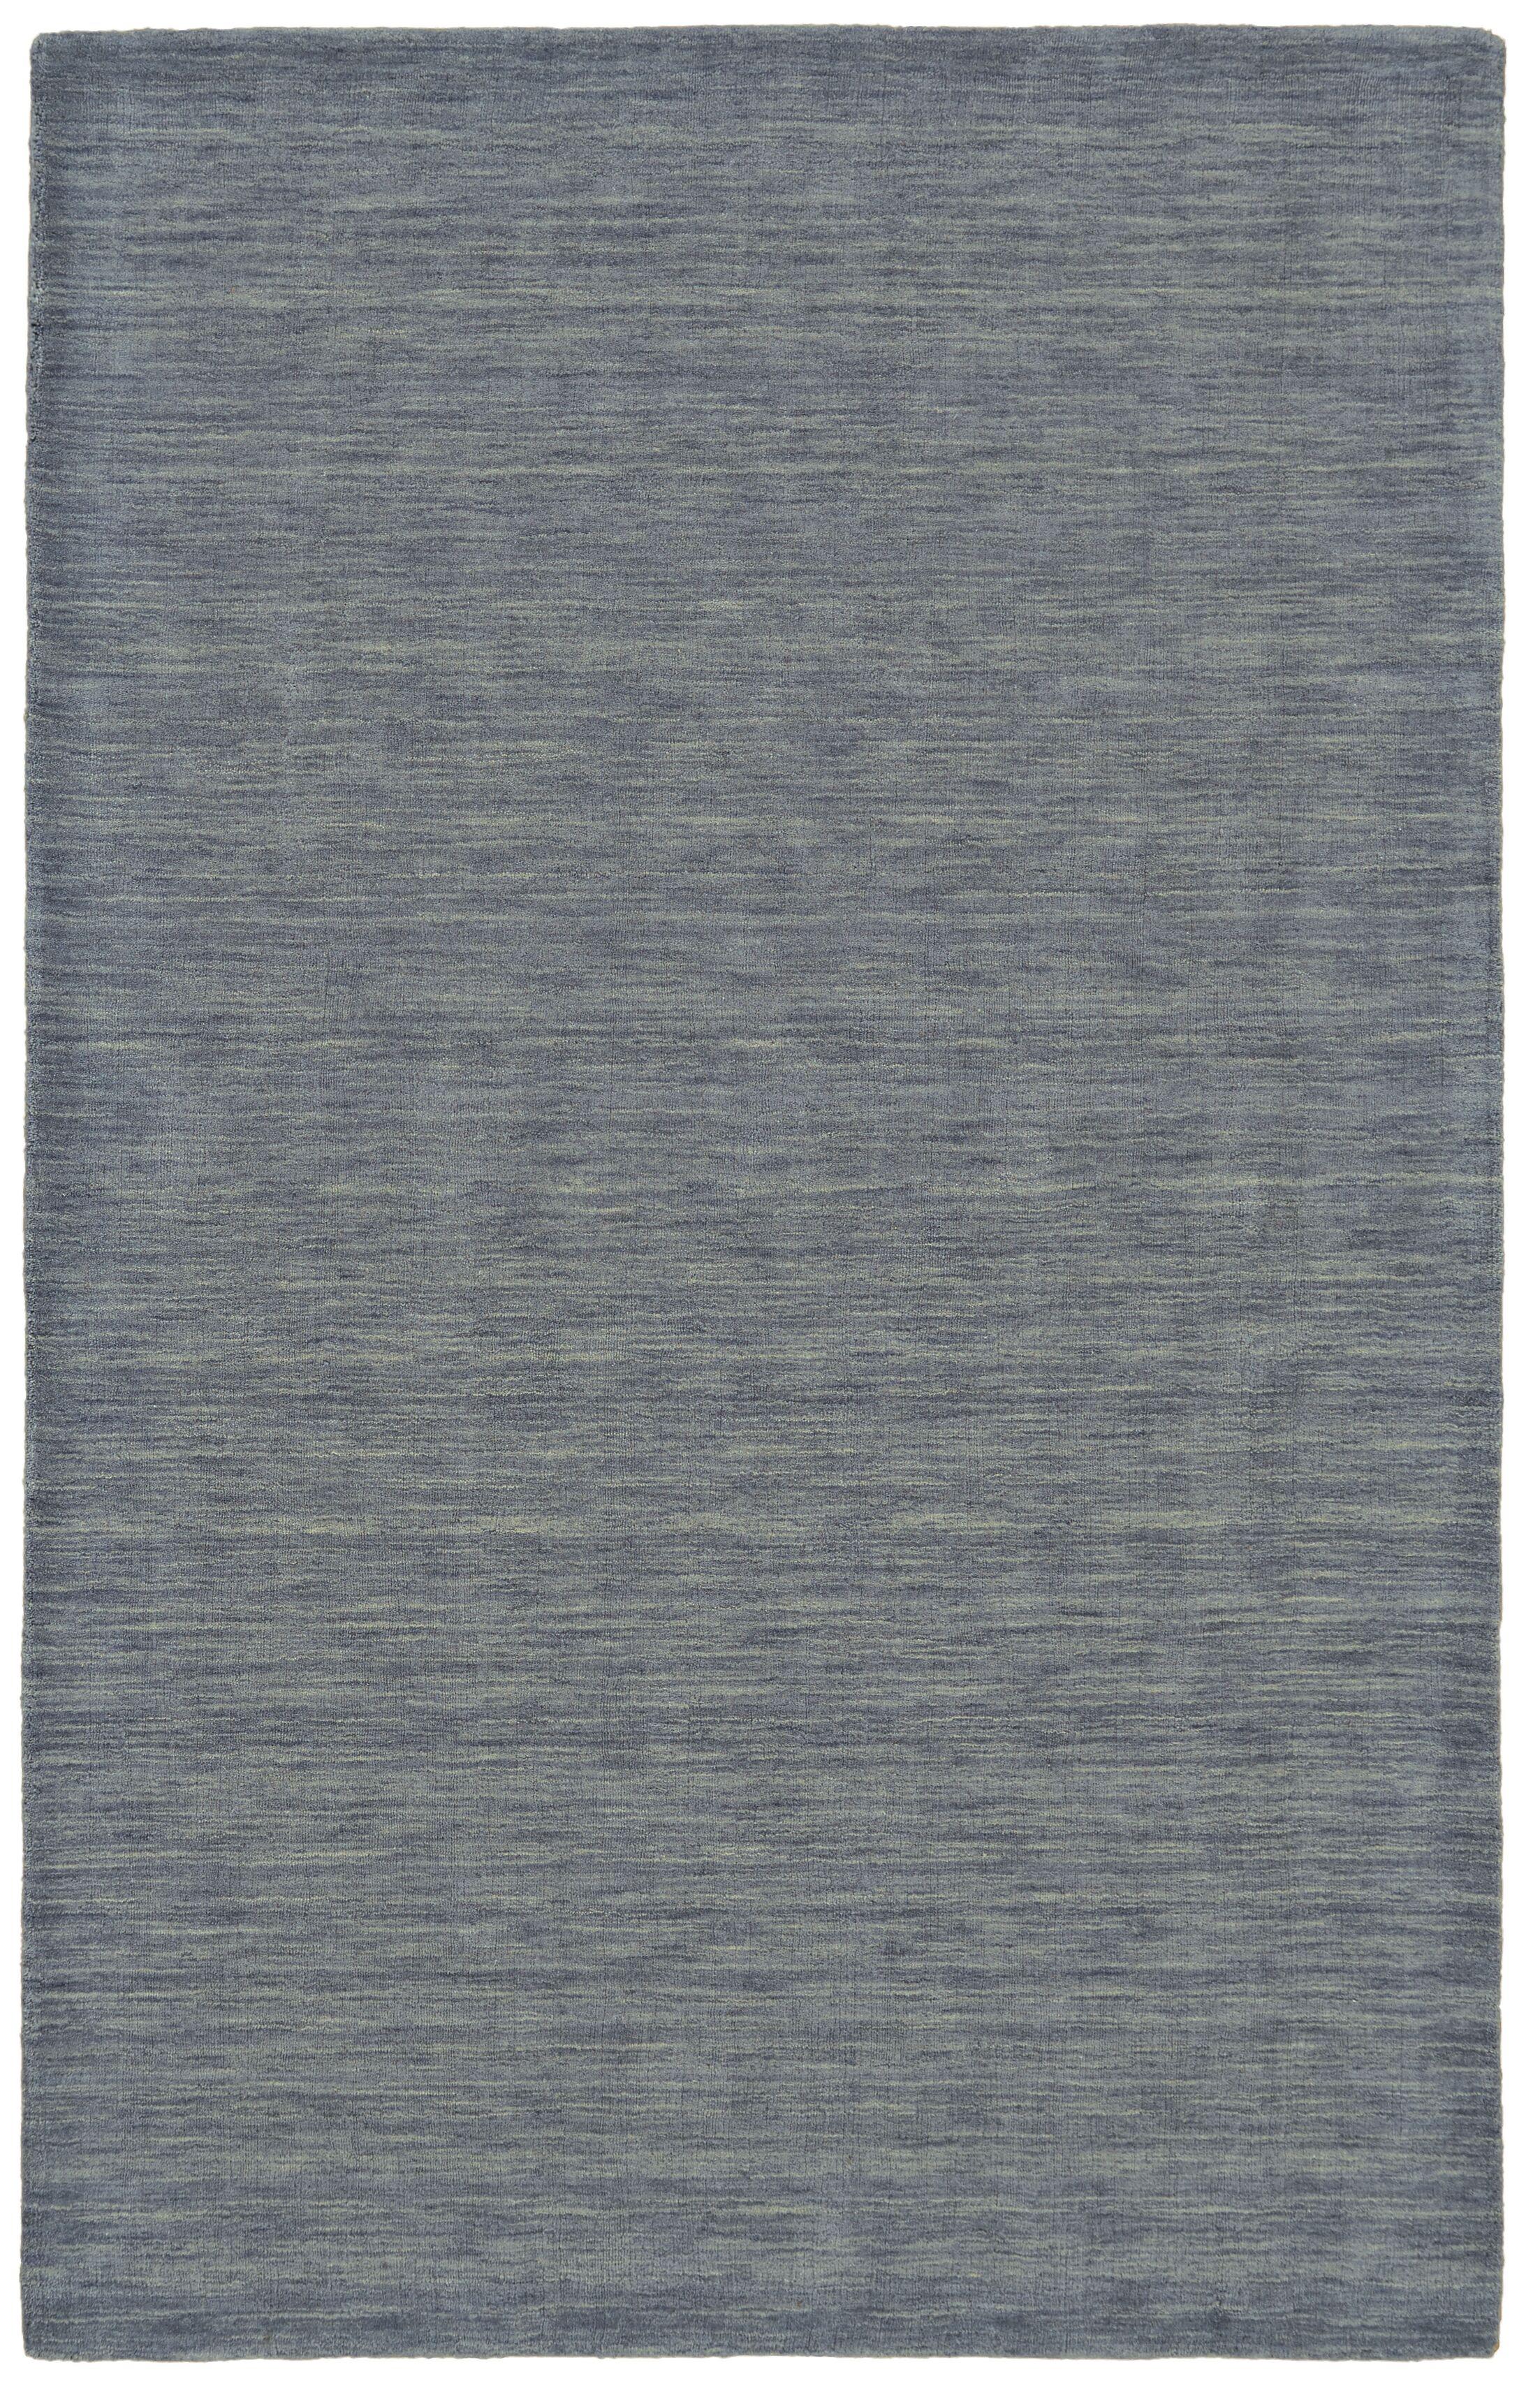 Larissa Smoke Rug Rug Size: Rectangle 8' x 11'